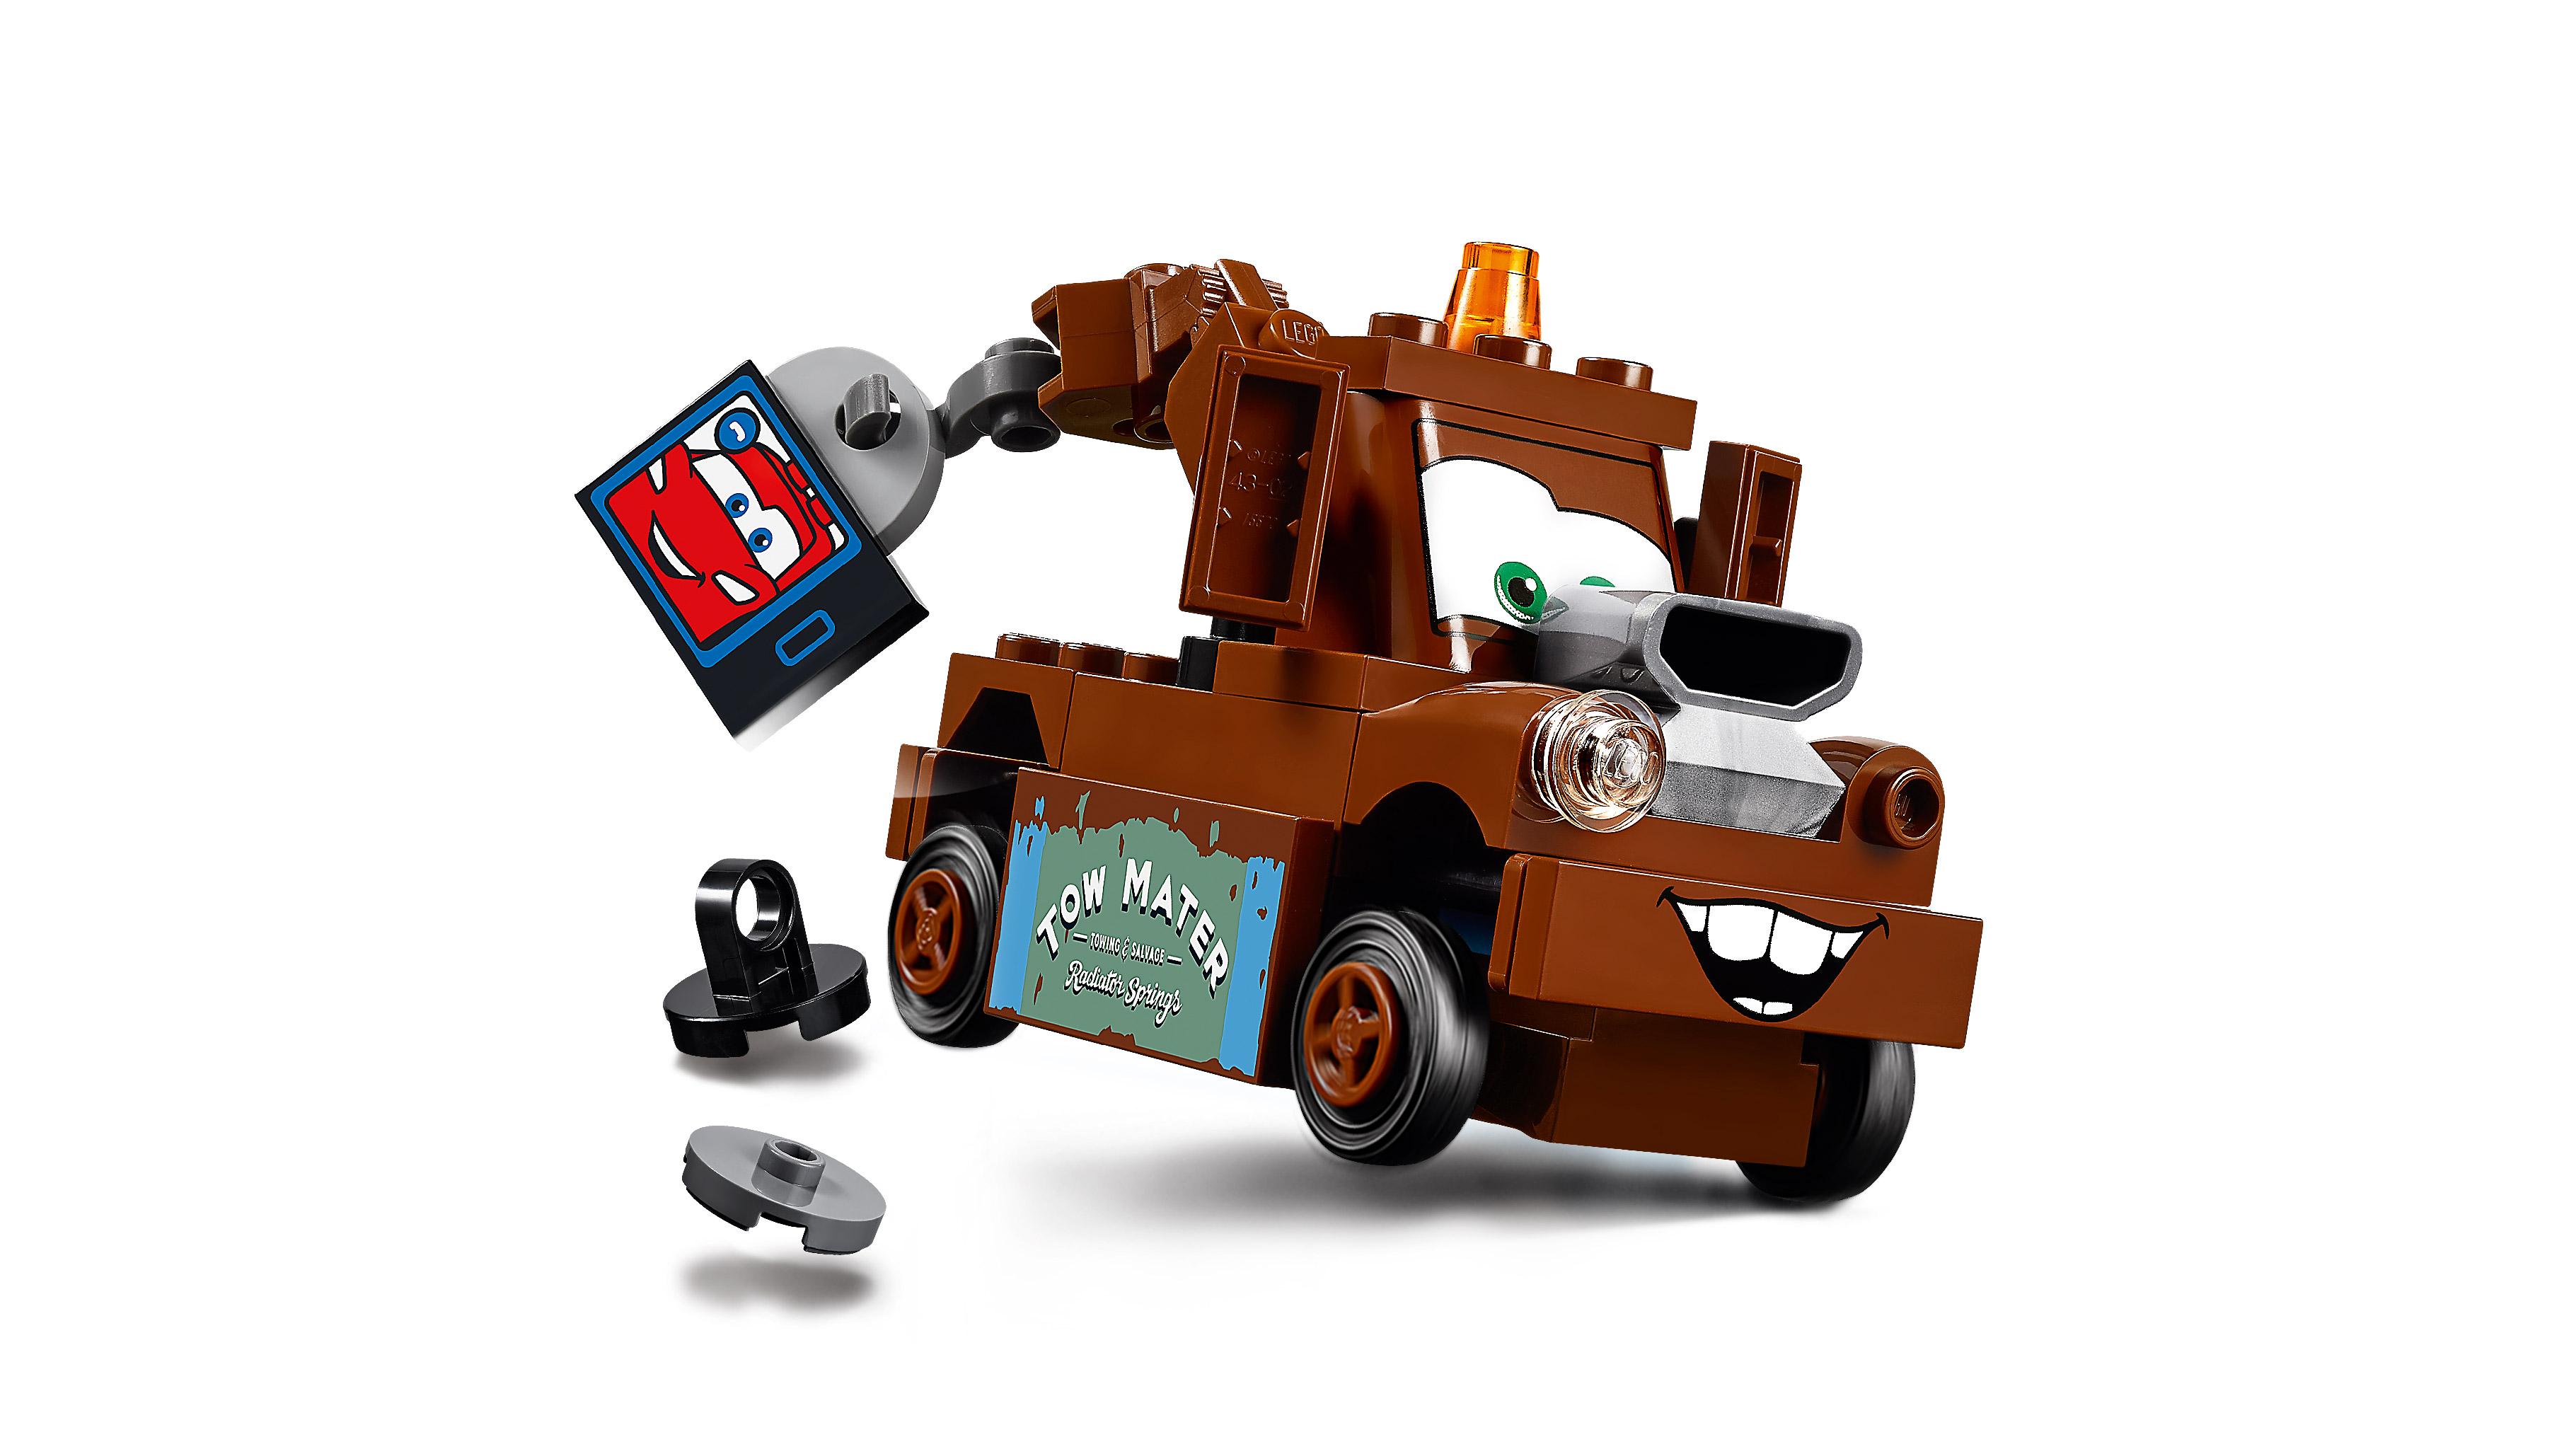 Lego 10733 Cars 3 Mater/'s Junkyard